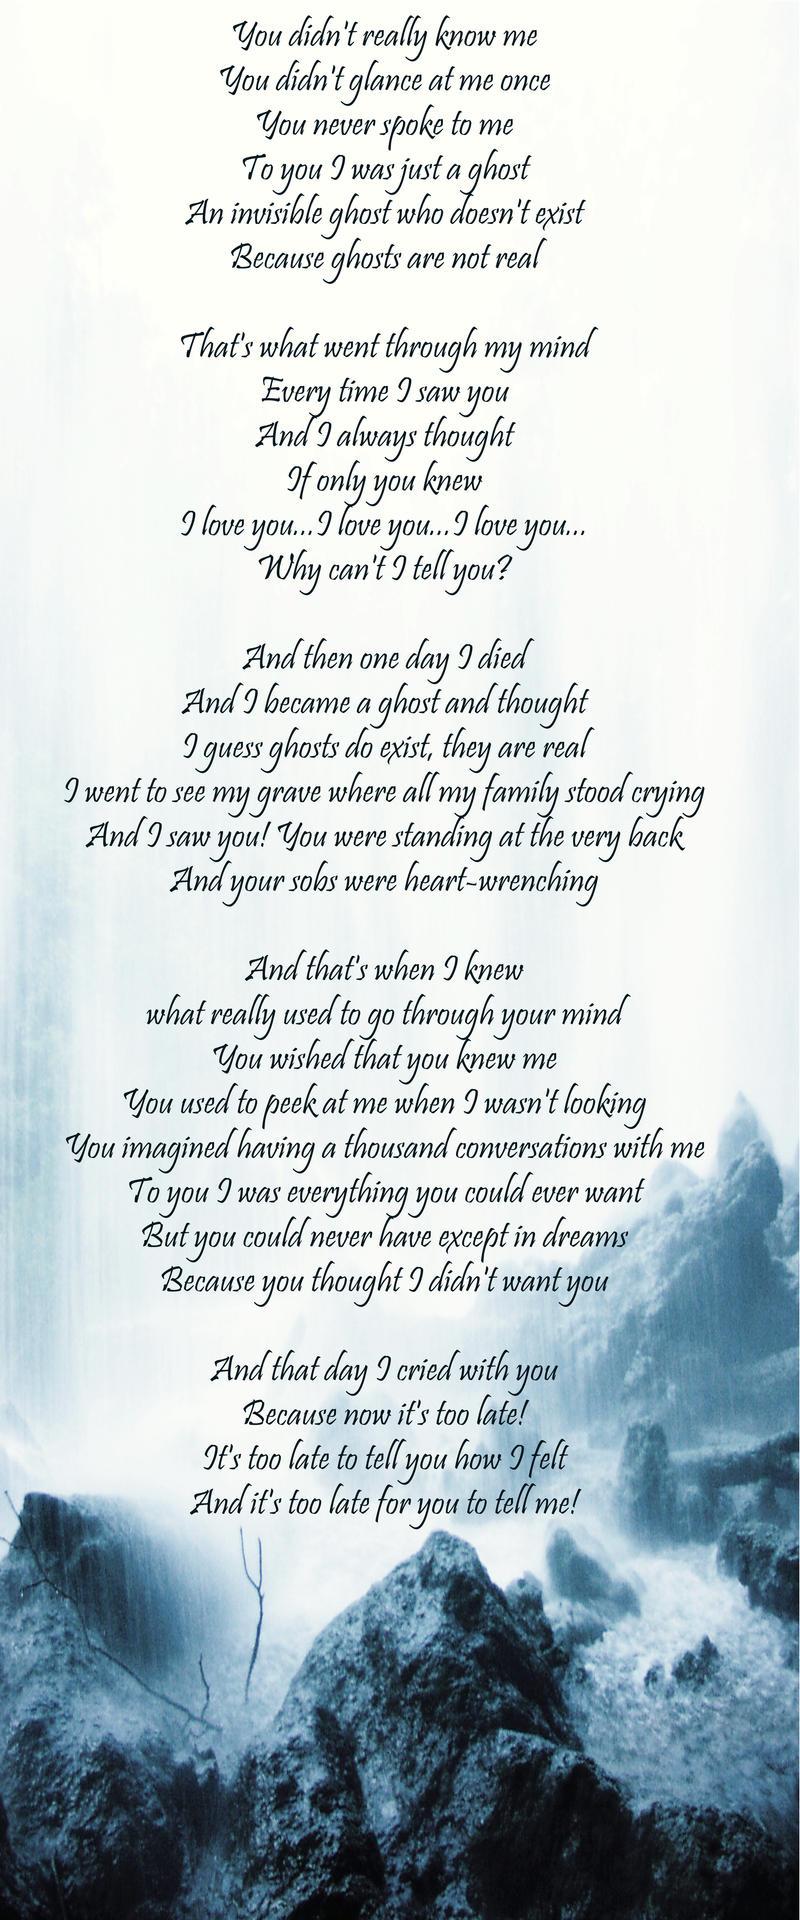 Engleska poezija u slici Regrets_by_funkygirl4ever95lit